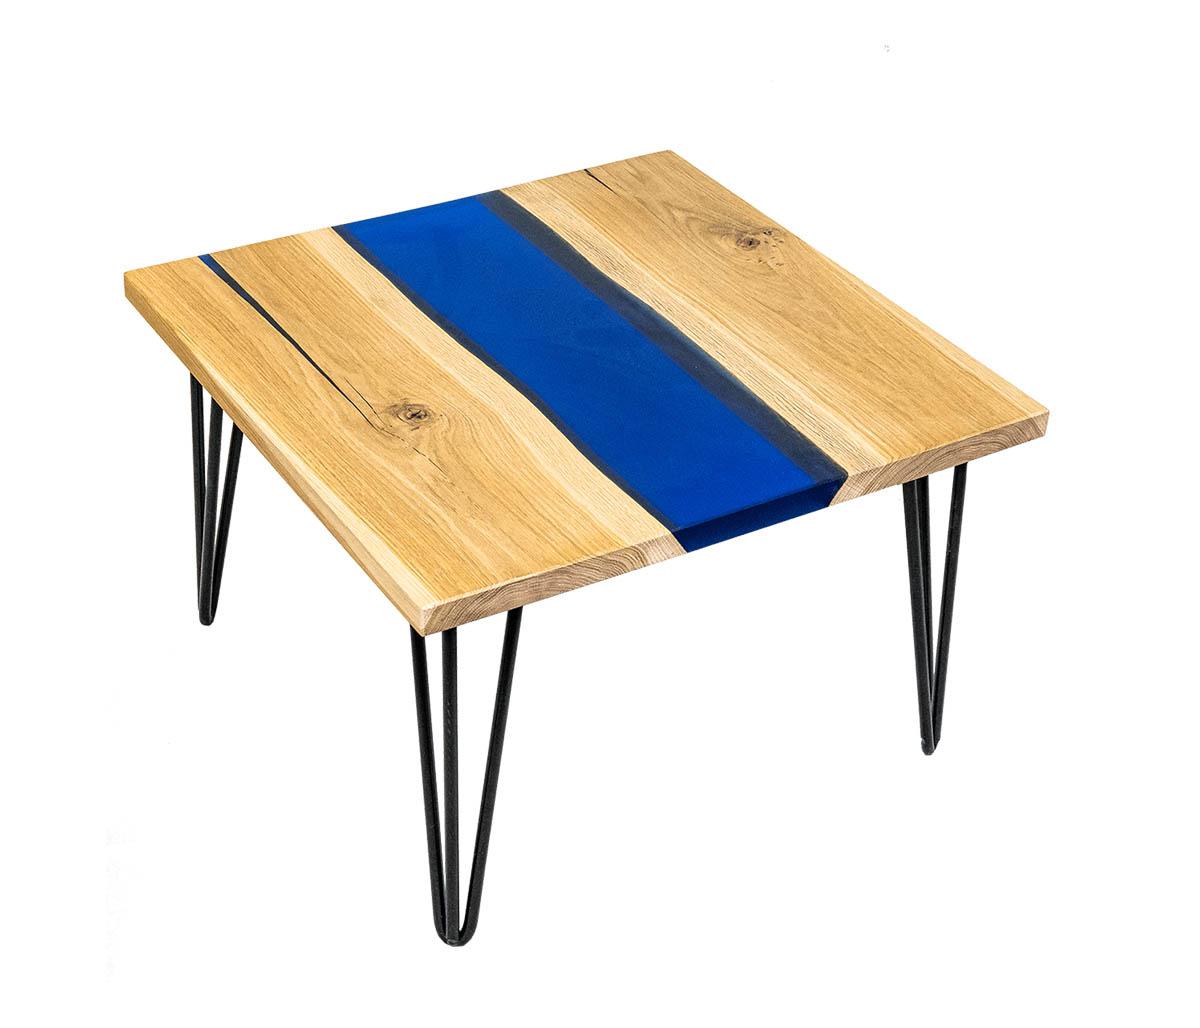 Tavolino In Legno E Resina Rinoteca